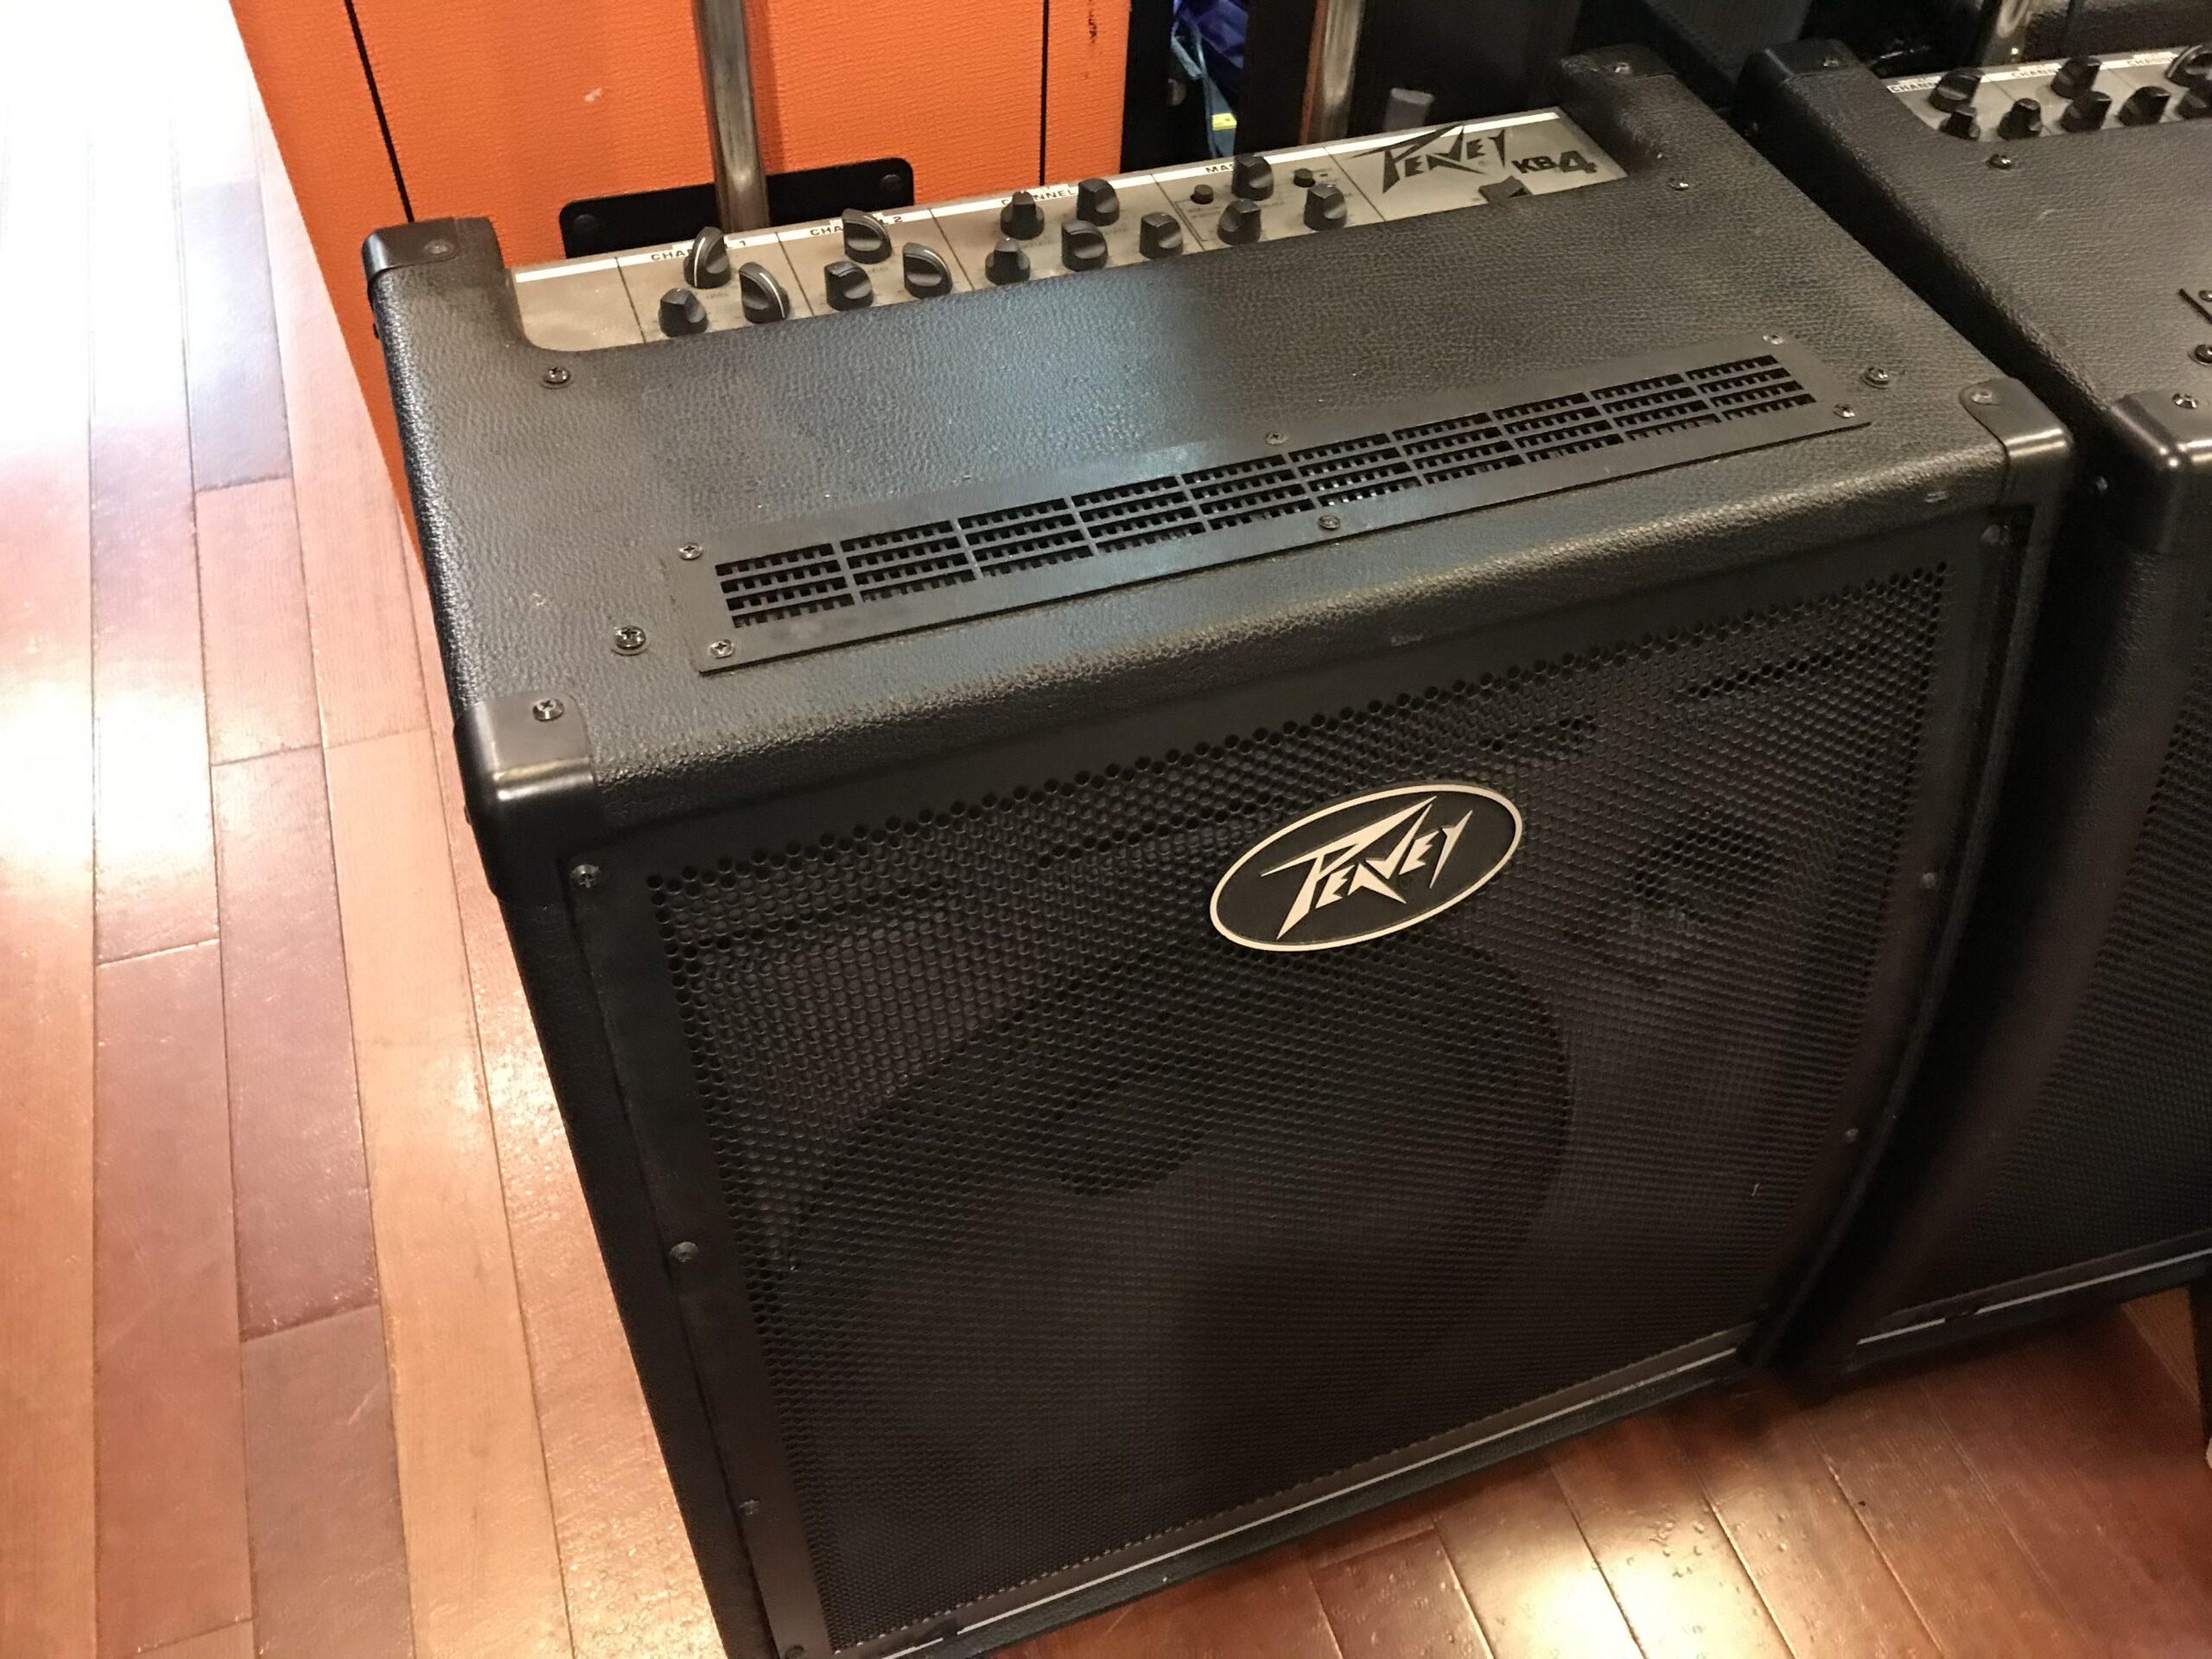 New Peavey KB 4 amp